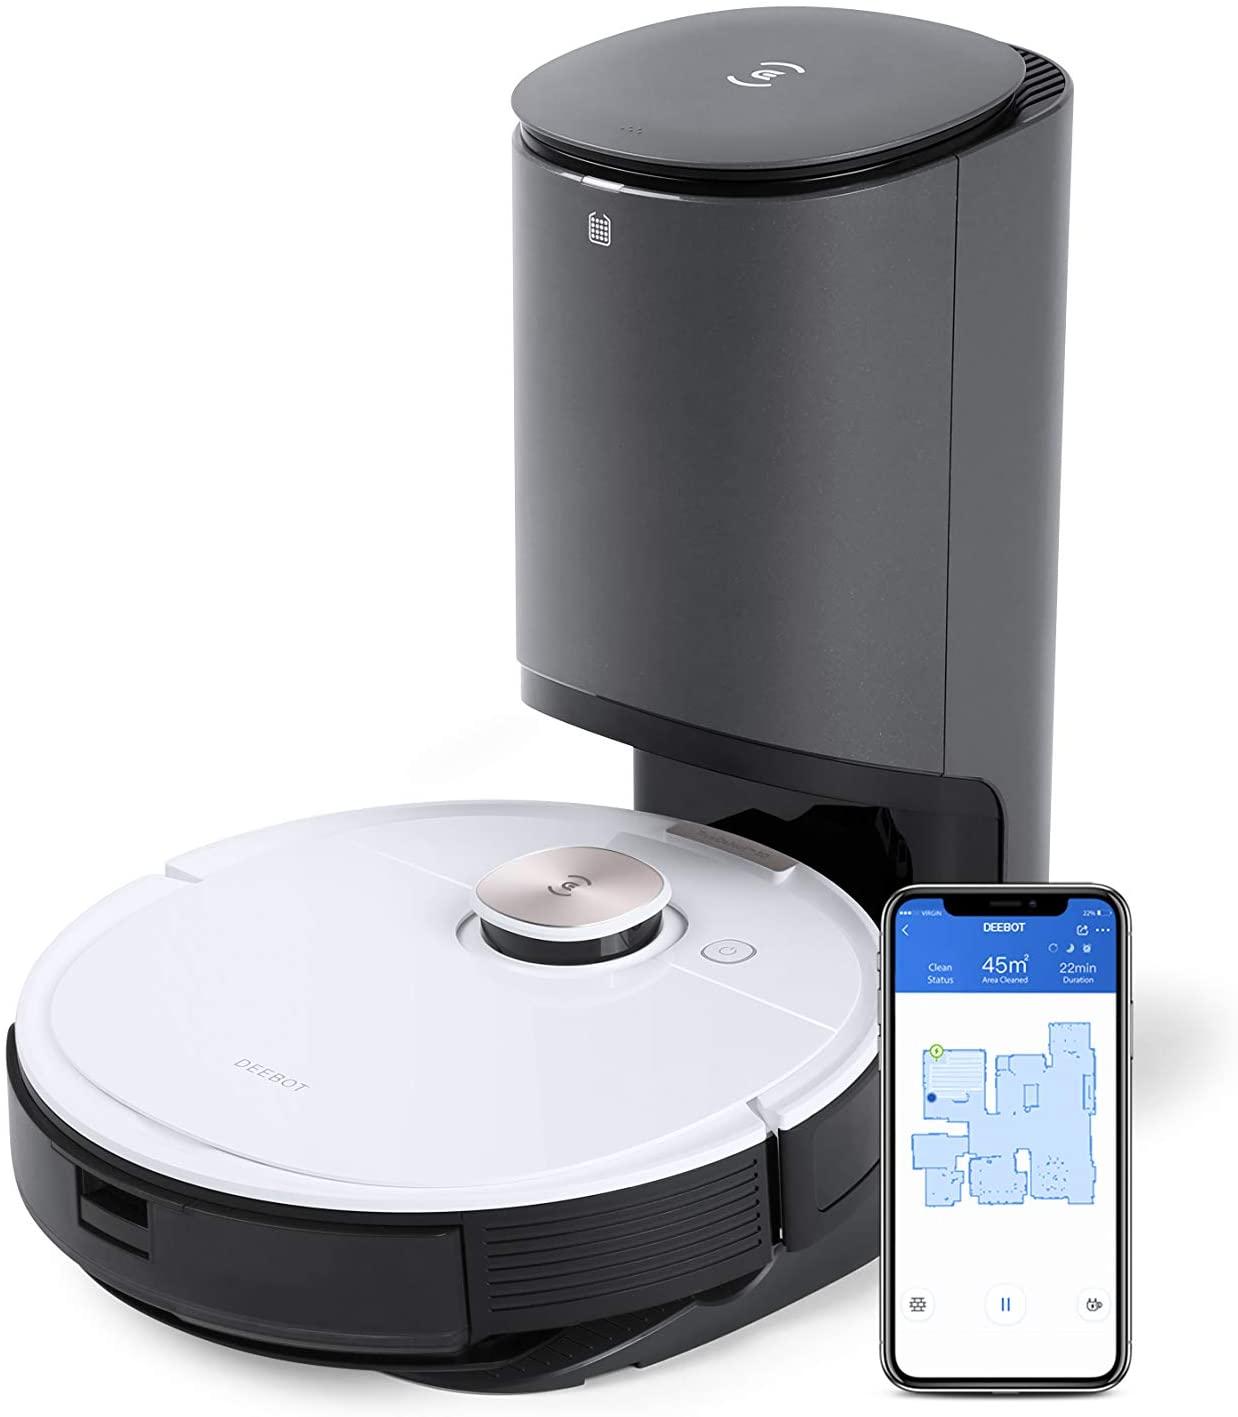 Aspirateur robot Ecovacs Deebot Ozmo T8 +